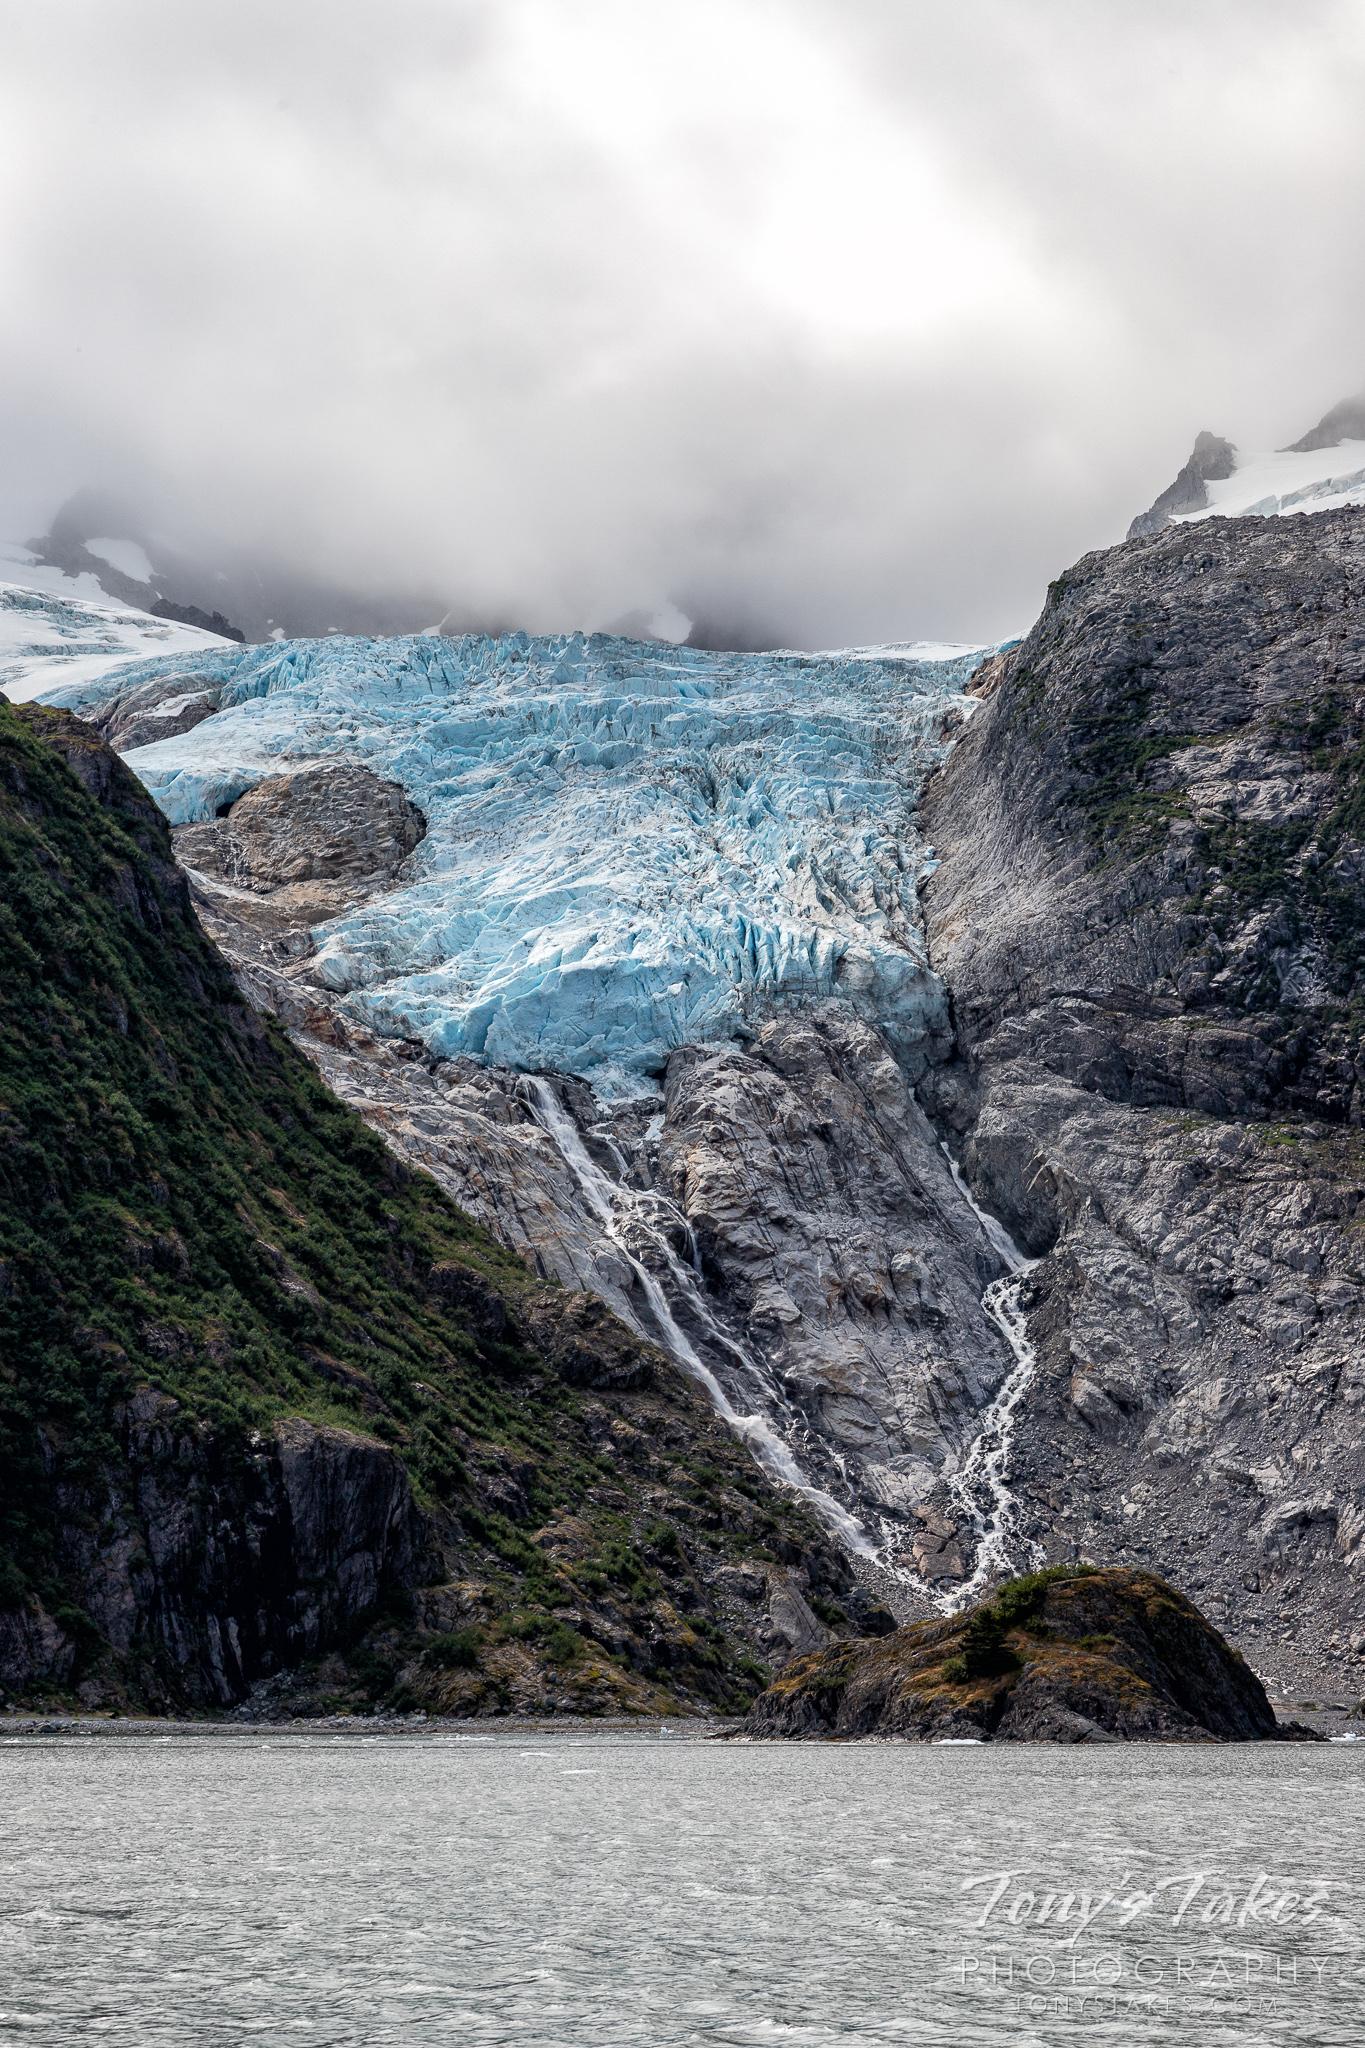 The Little Holgate Glacier in Kenai Fjords National Park, Alaska. (© Tony's Takes)